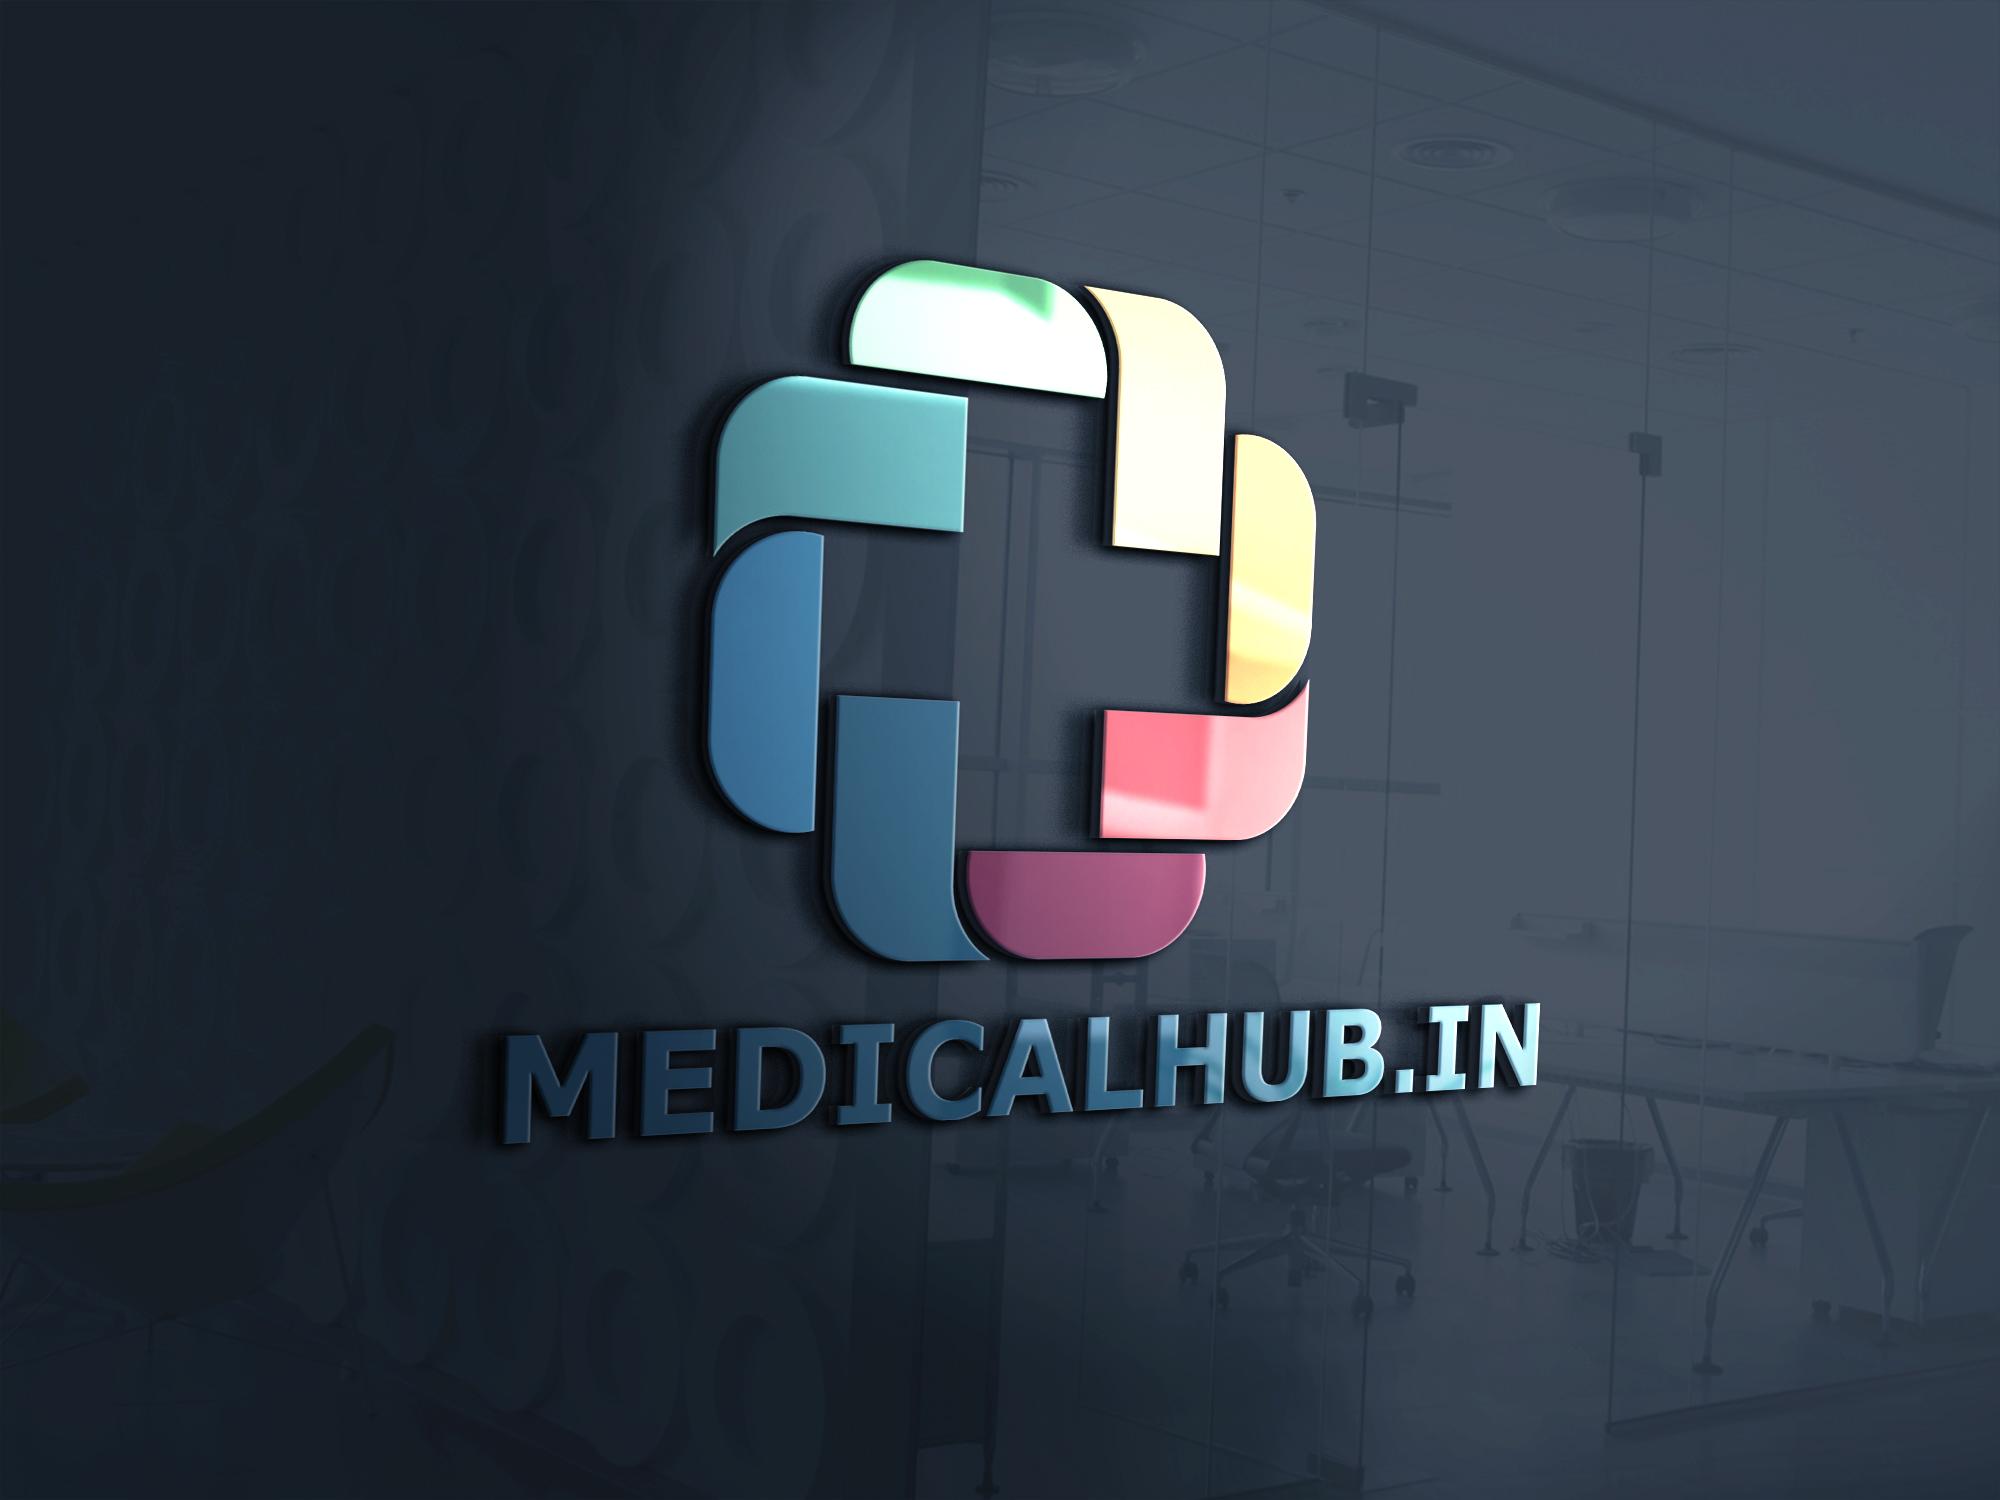 Medicine hub logo design by Badri design